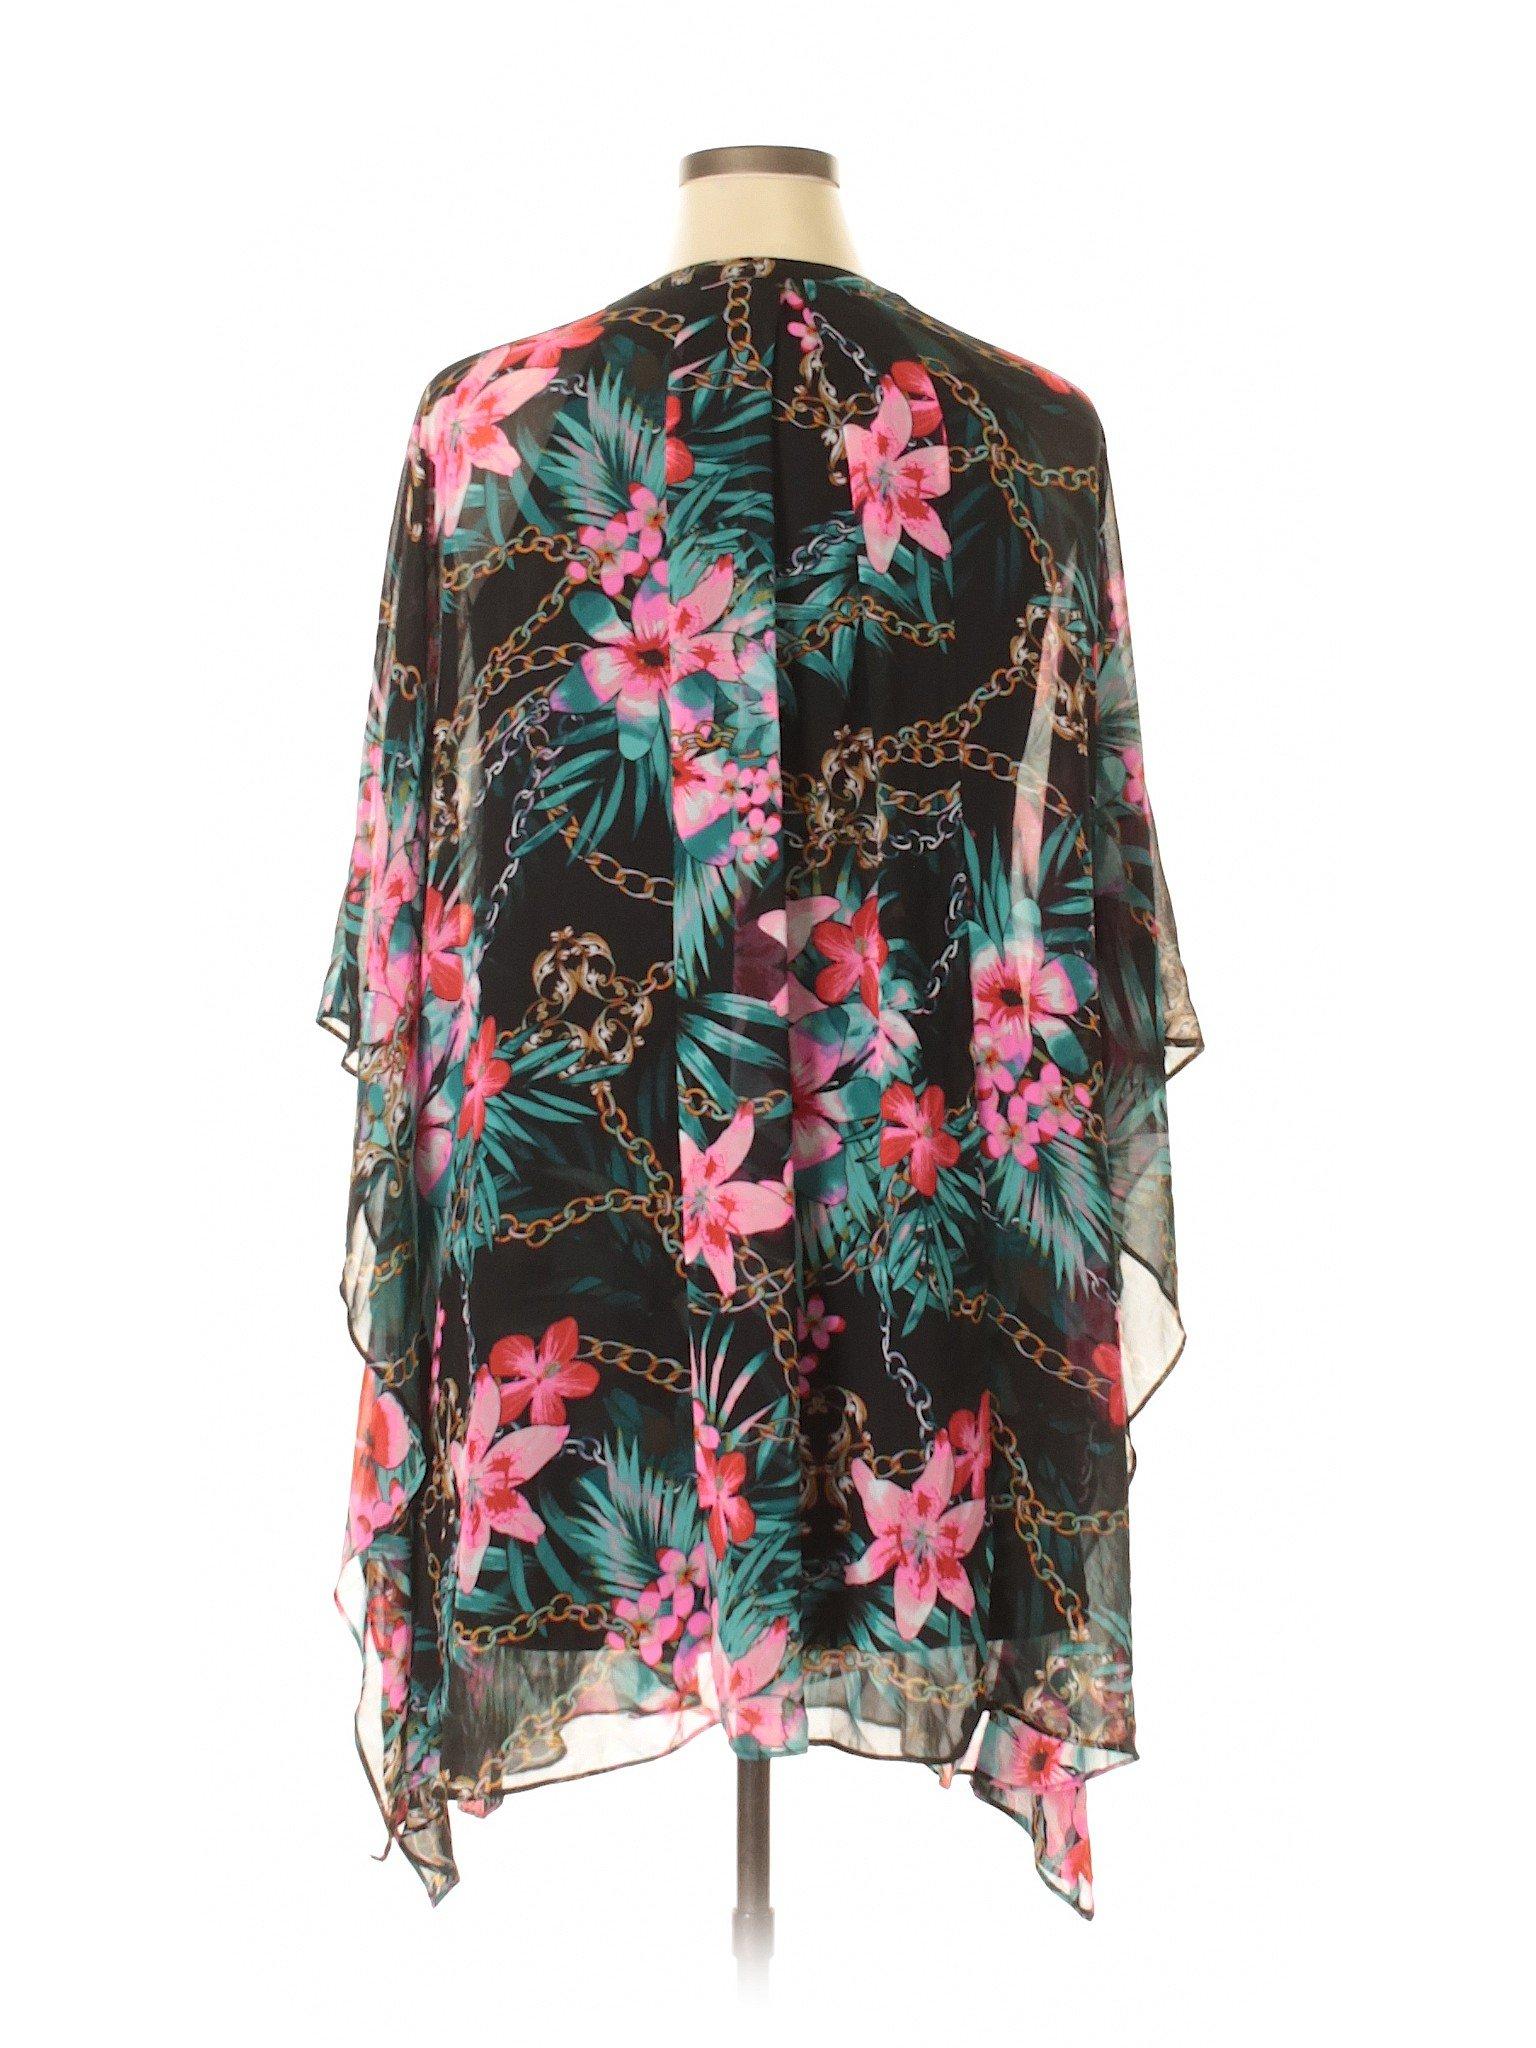 Lopez Dress Winter Casual Jennifer Boutique RnExp4B